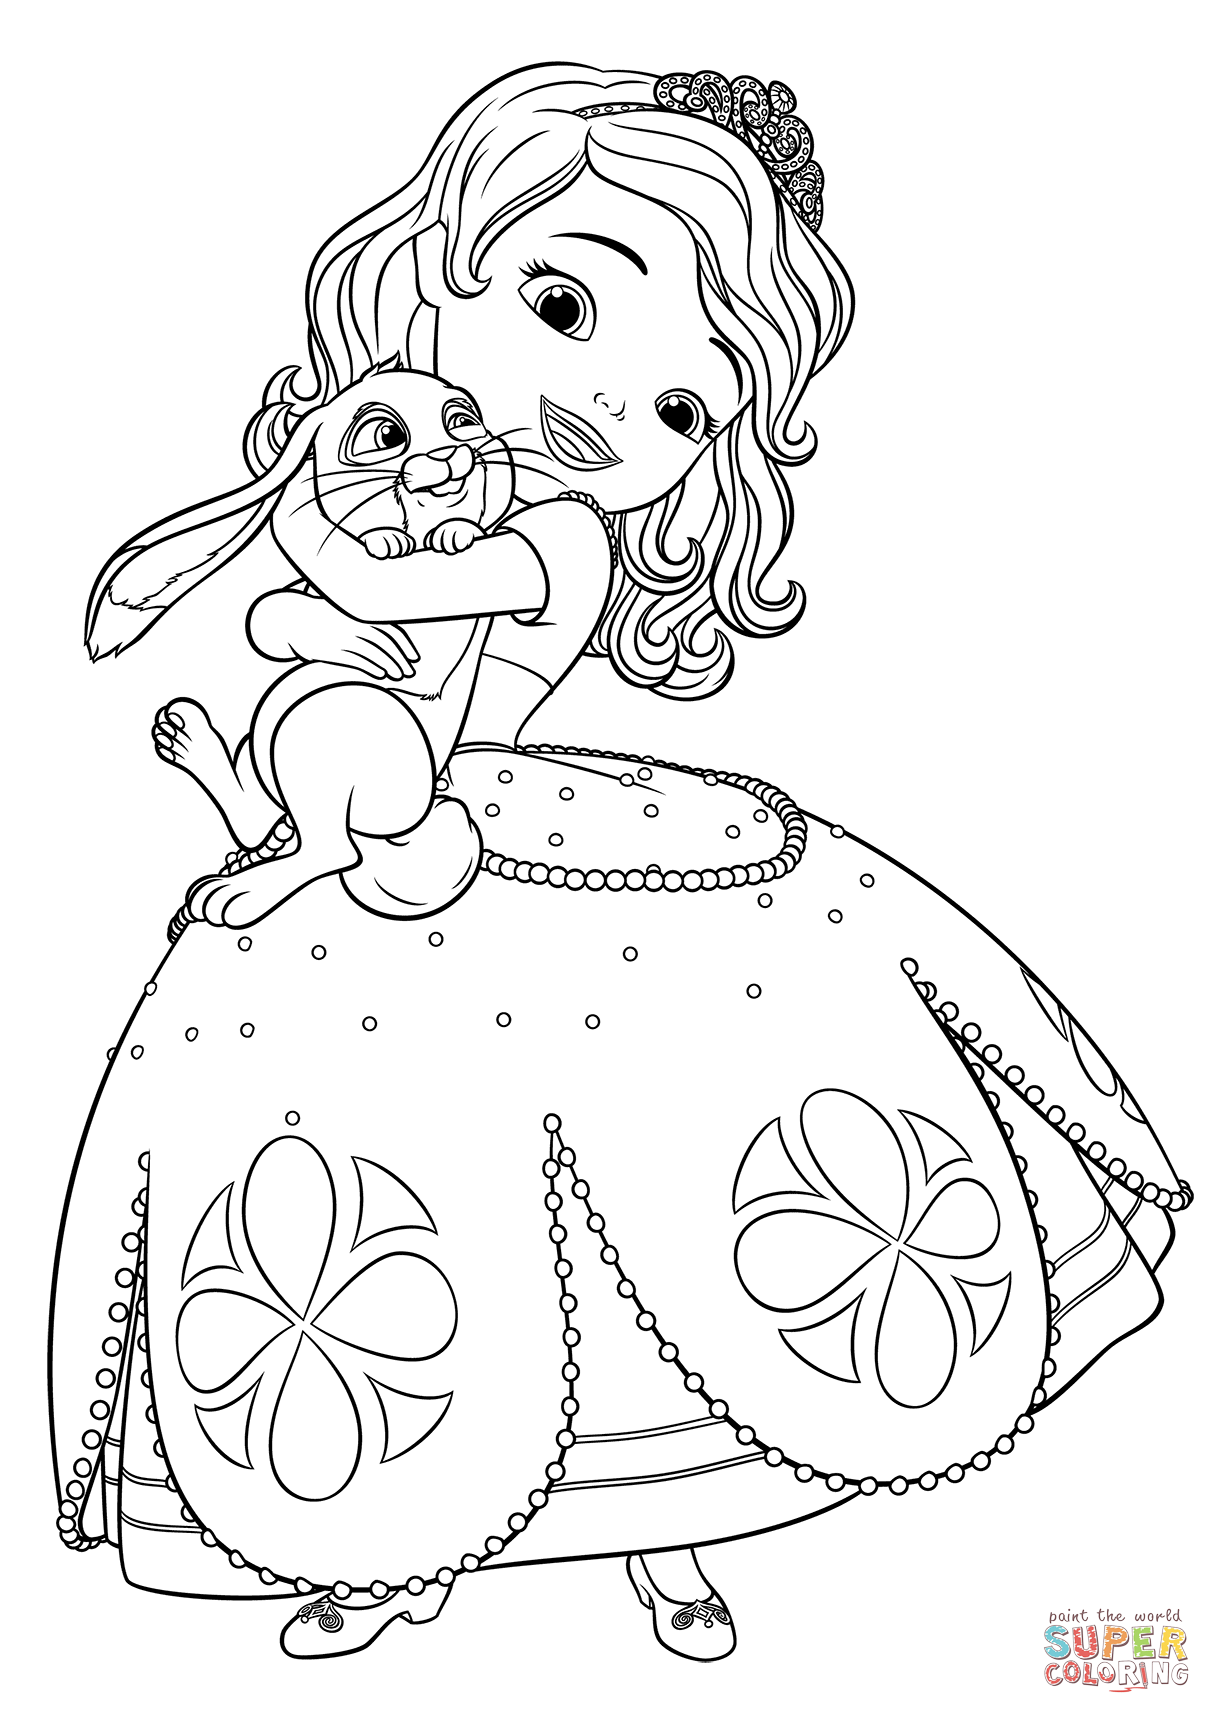 Princess Moana Super Coloring Disney Princess Coloring Pages Moana Coloring Pages Princess Coloring Pages